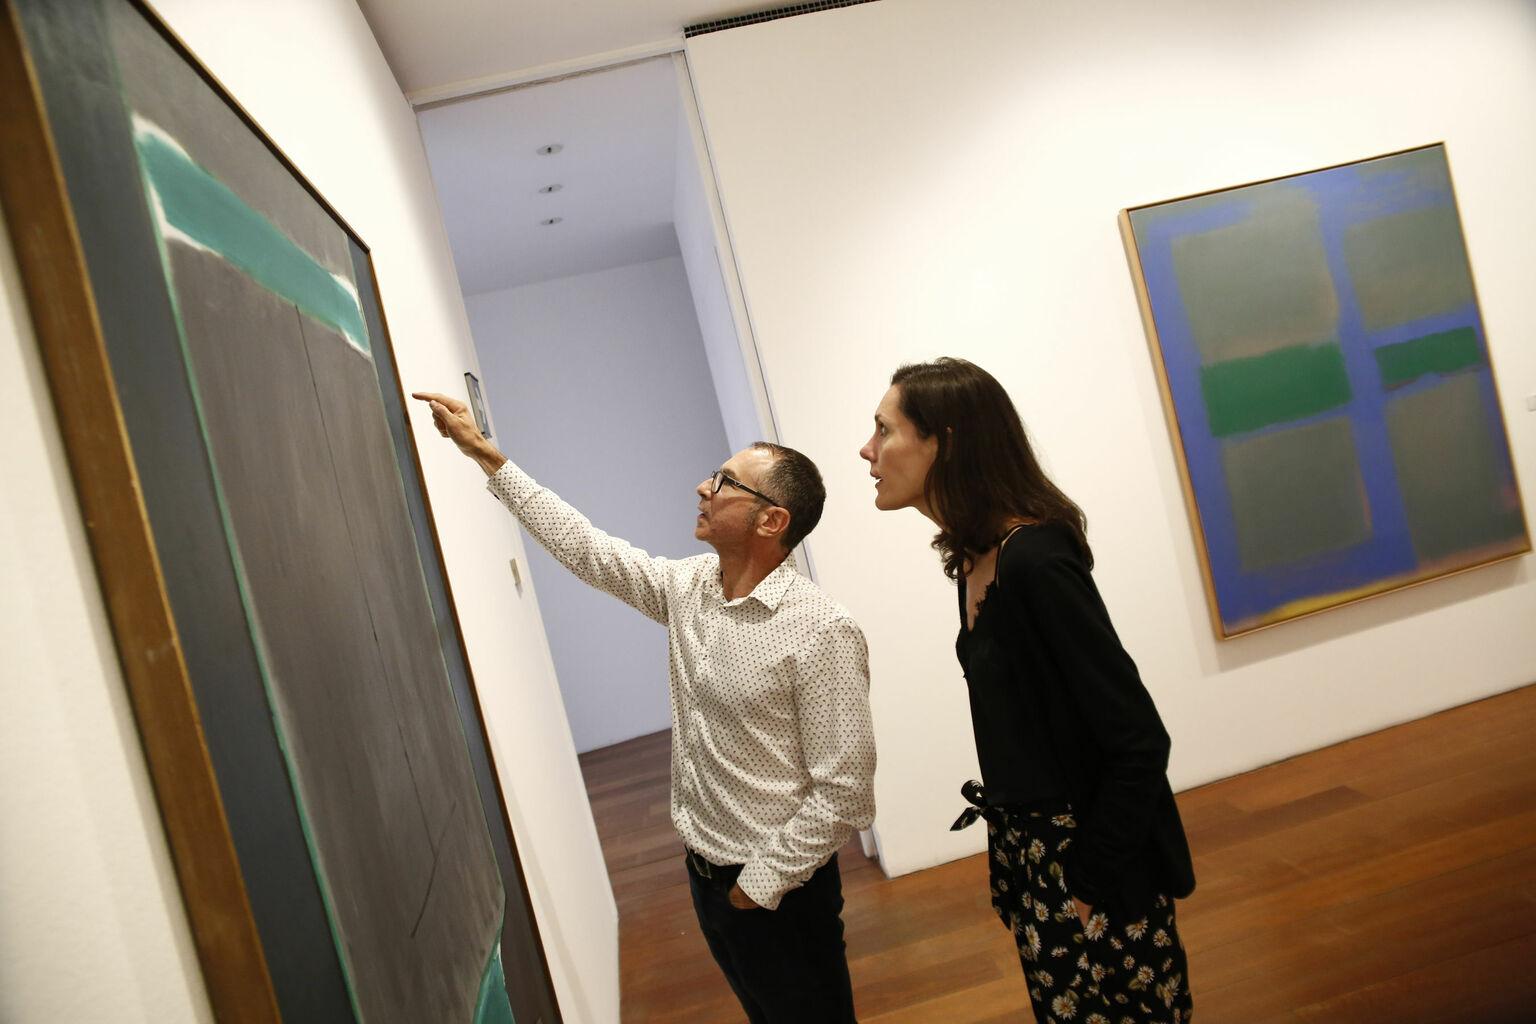 obras de arte geniales para sala de estar Guerrero Vicente Crtica Dilogo Sensato A Dos Voces